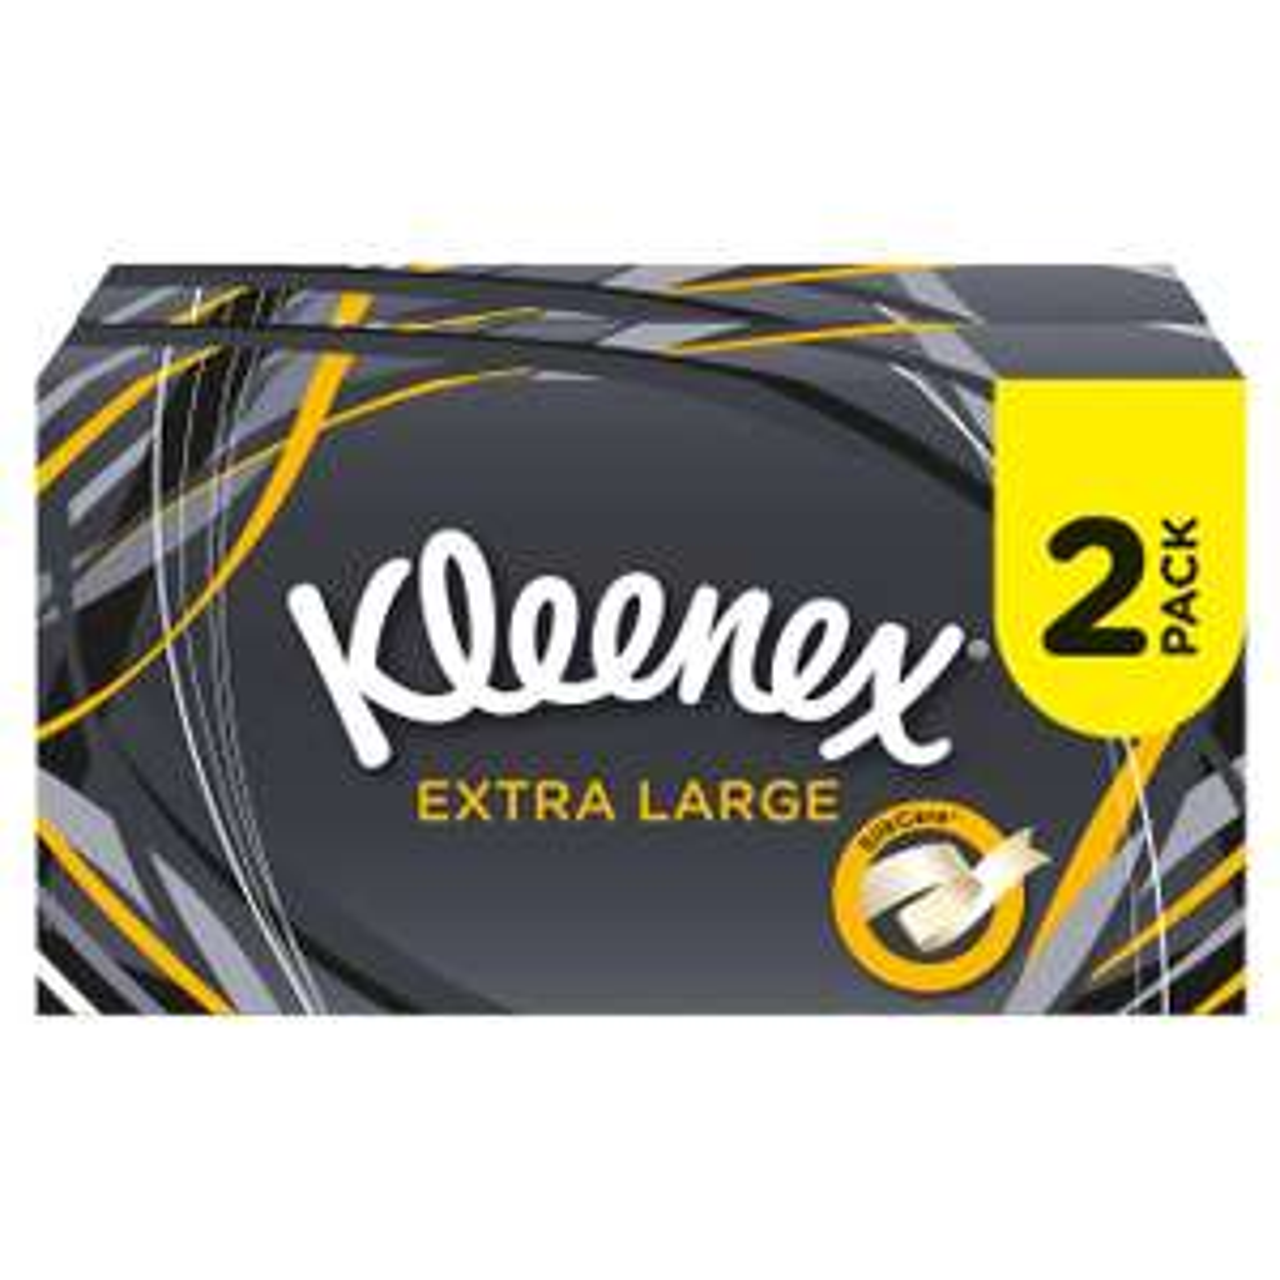 Kleenex XL 2 x 90 per pack £2 Instore & Online @ Morrisons